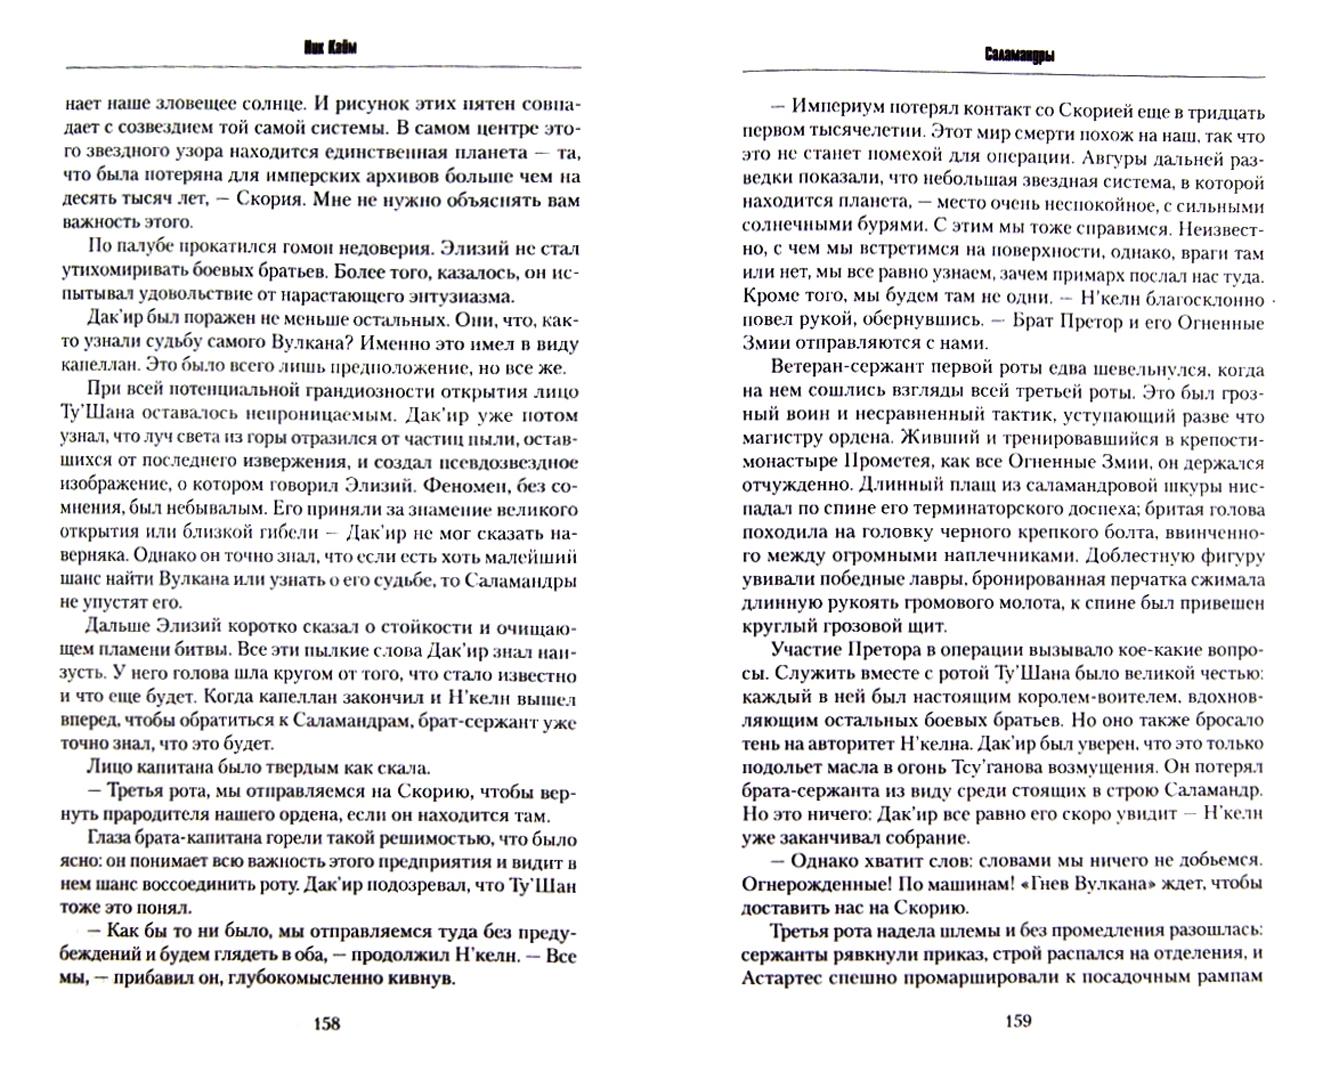 Иллюстрация 1 из 4 для Саламандры - Ник Кайм | Лабиринт - книги. Источник: Лабиринт